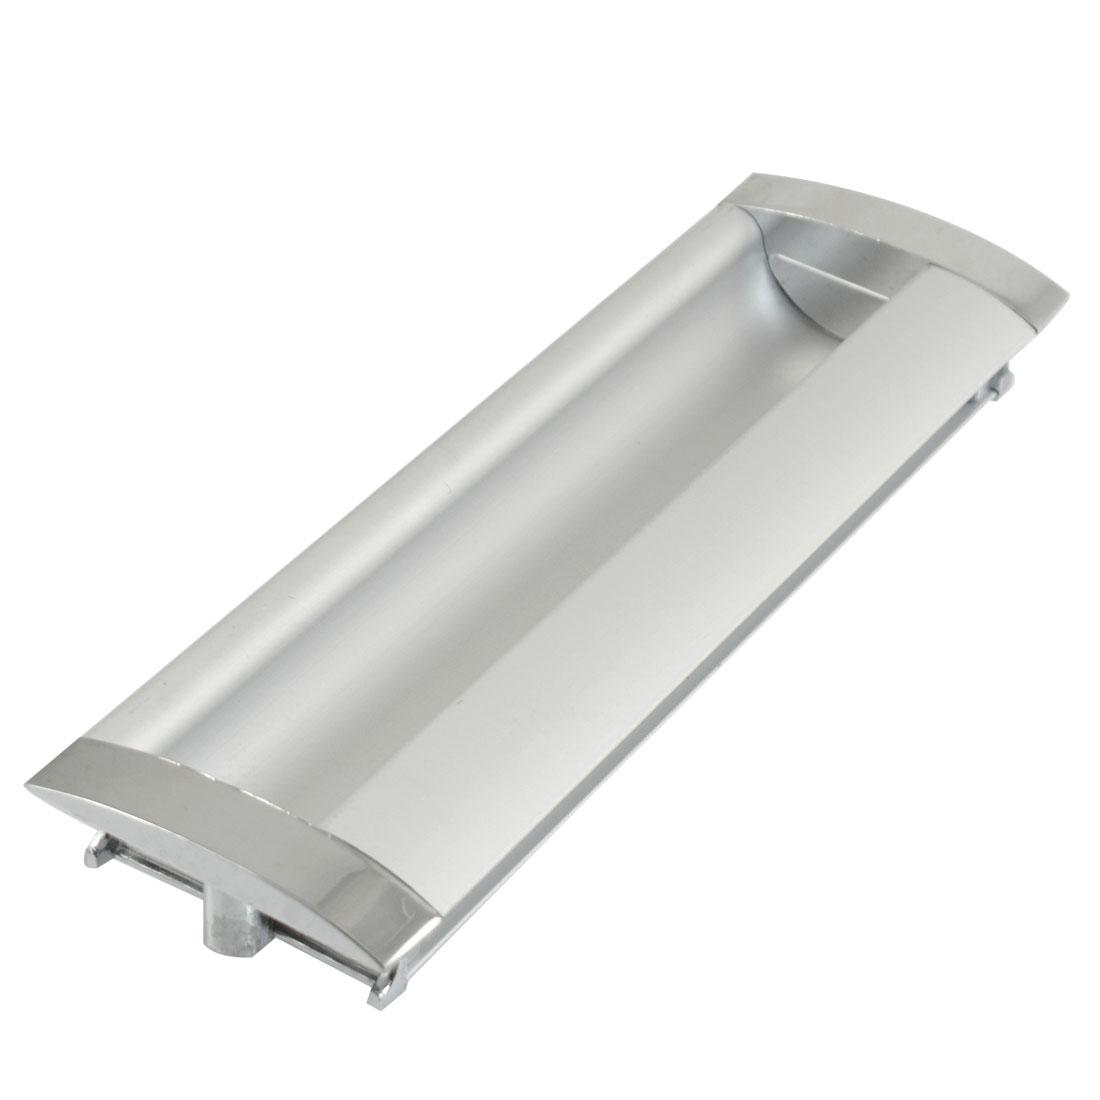 "14cm 5.5"" Length Rectangle Shaped Sliding Door Cabinet Recessed Flush Pull"